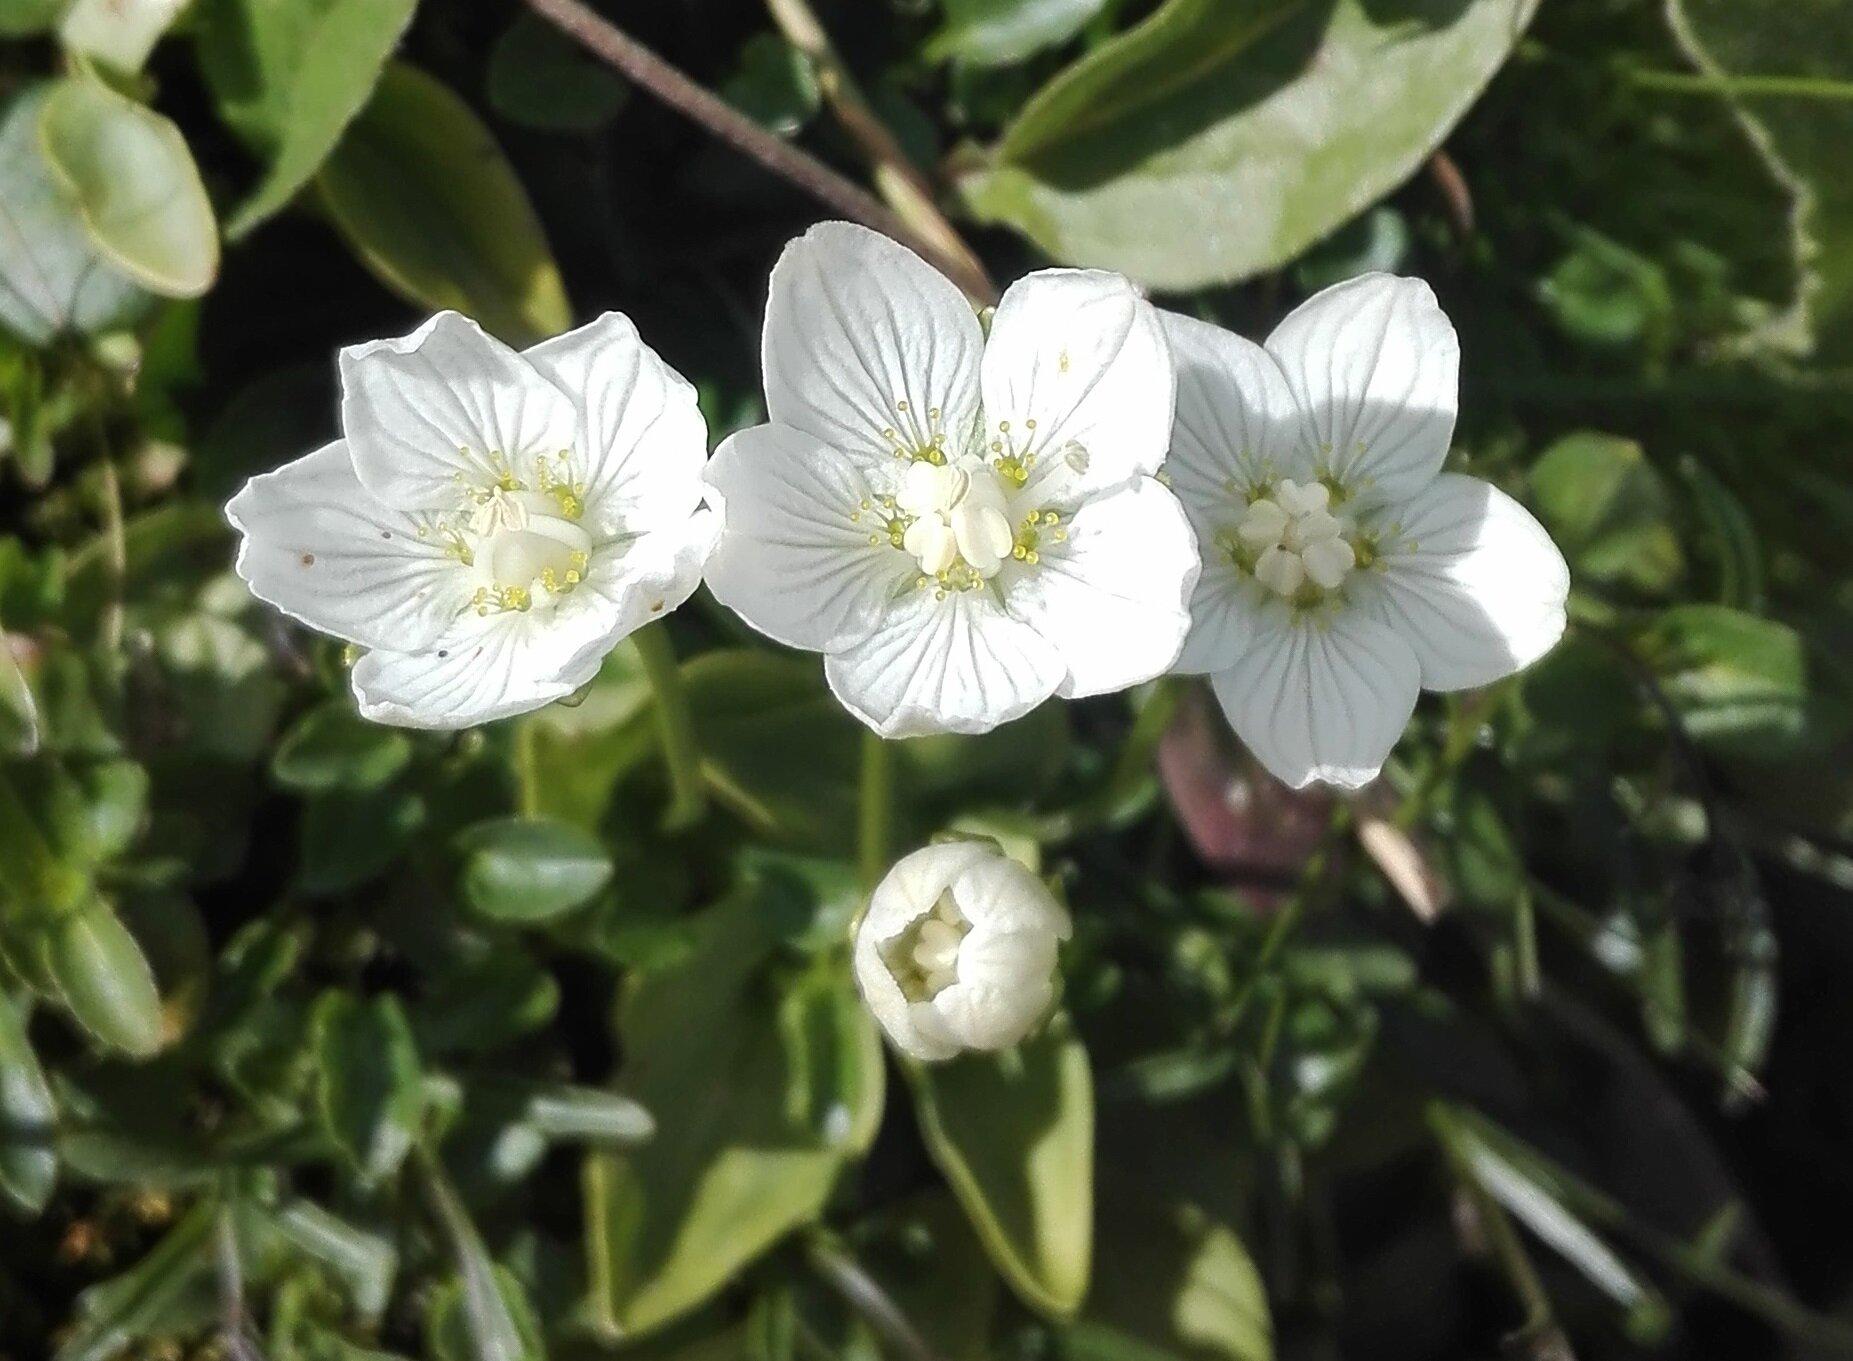 Grass of Parnassus (Parnassia palustris)